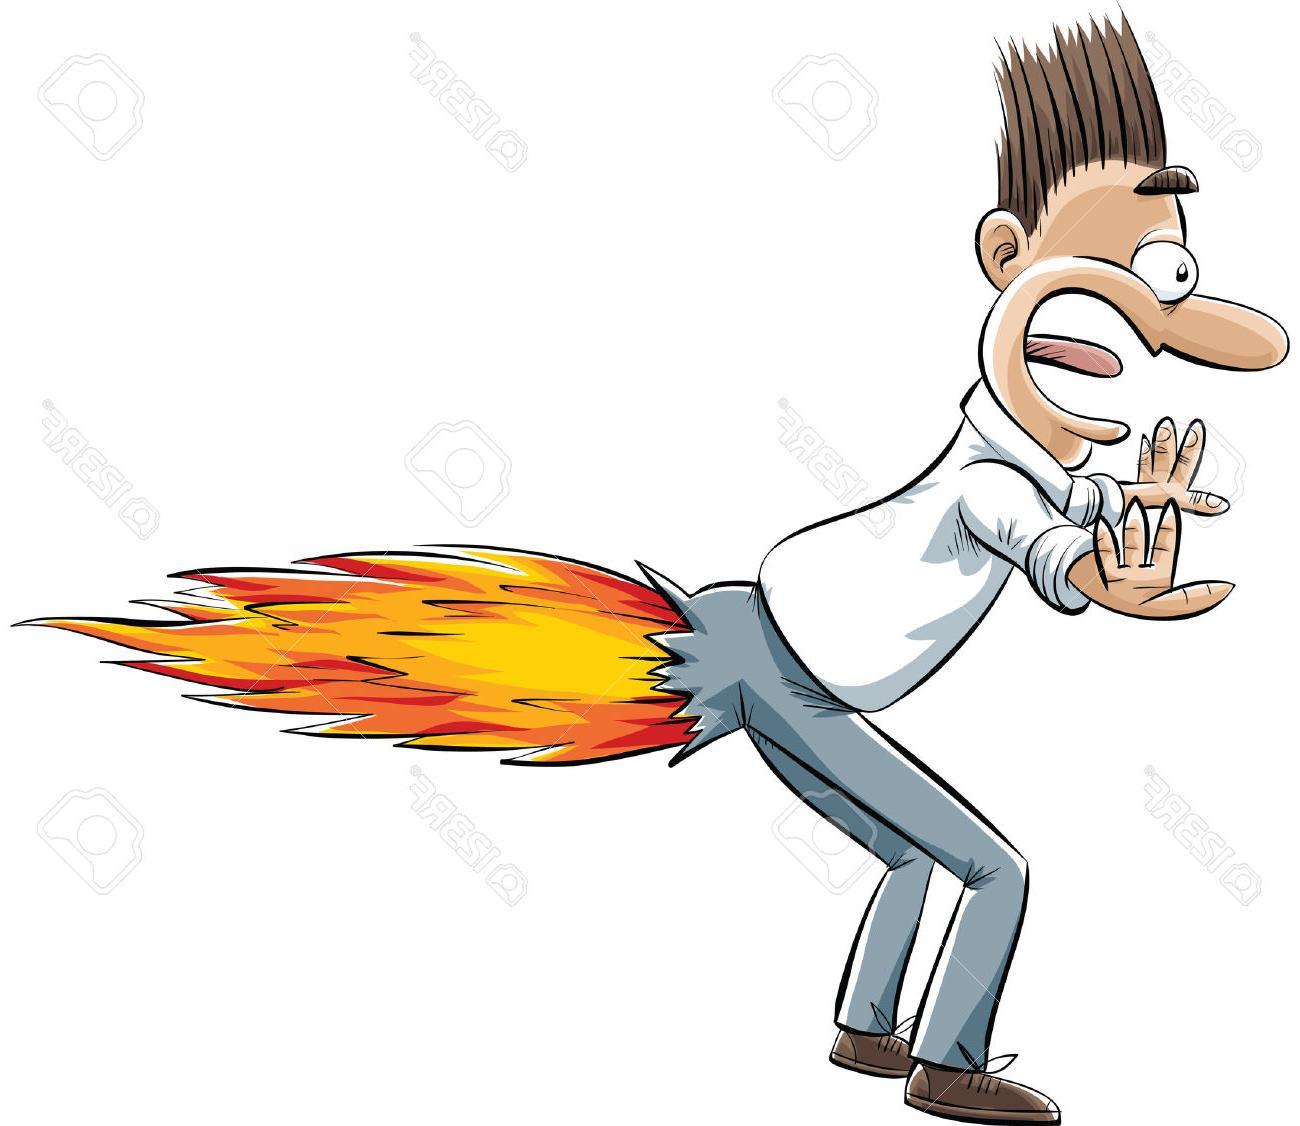 Fart clipart blast. Cliparts free download best